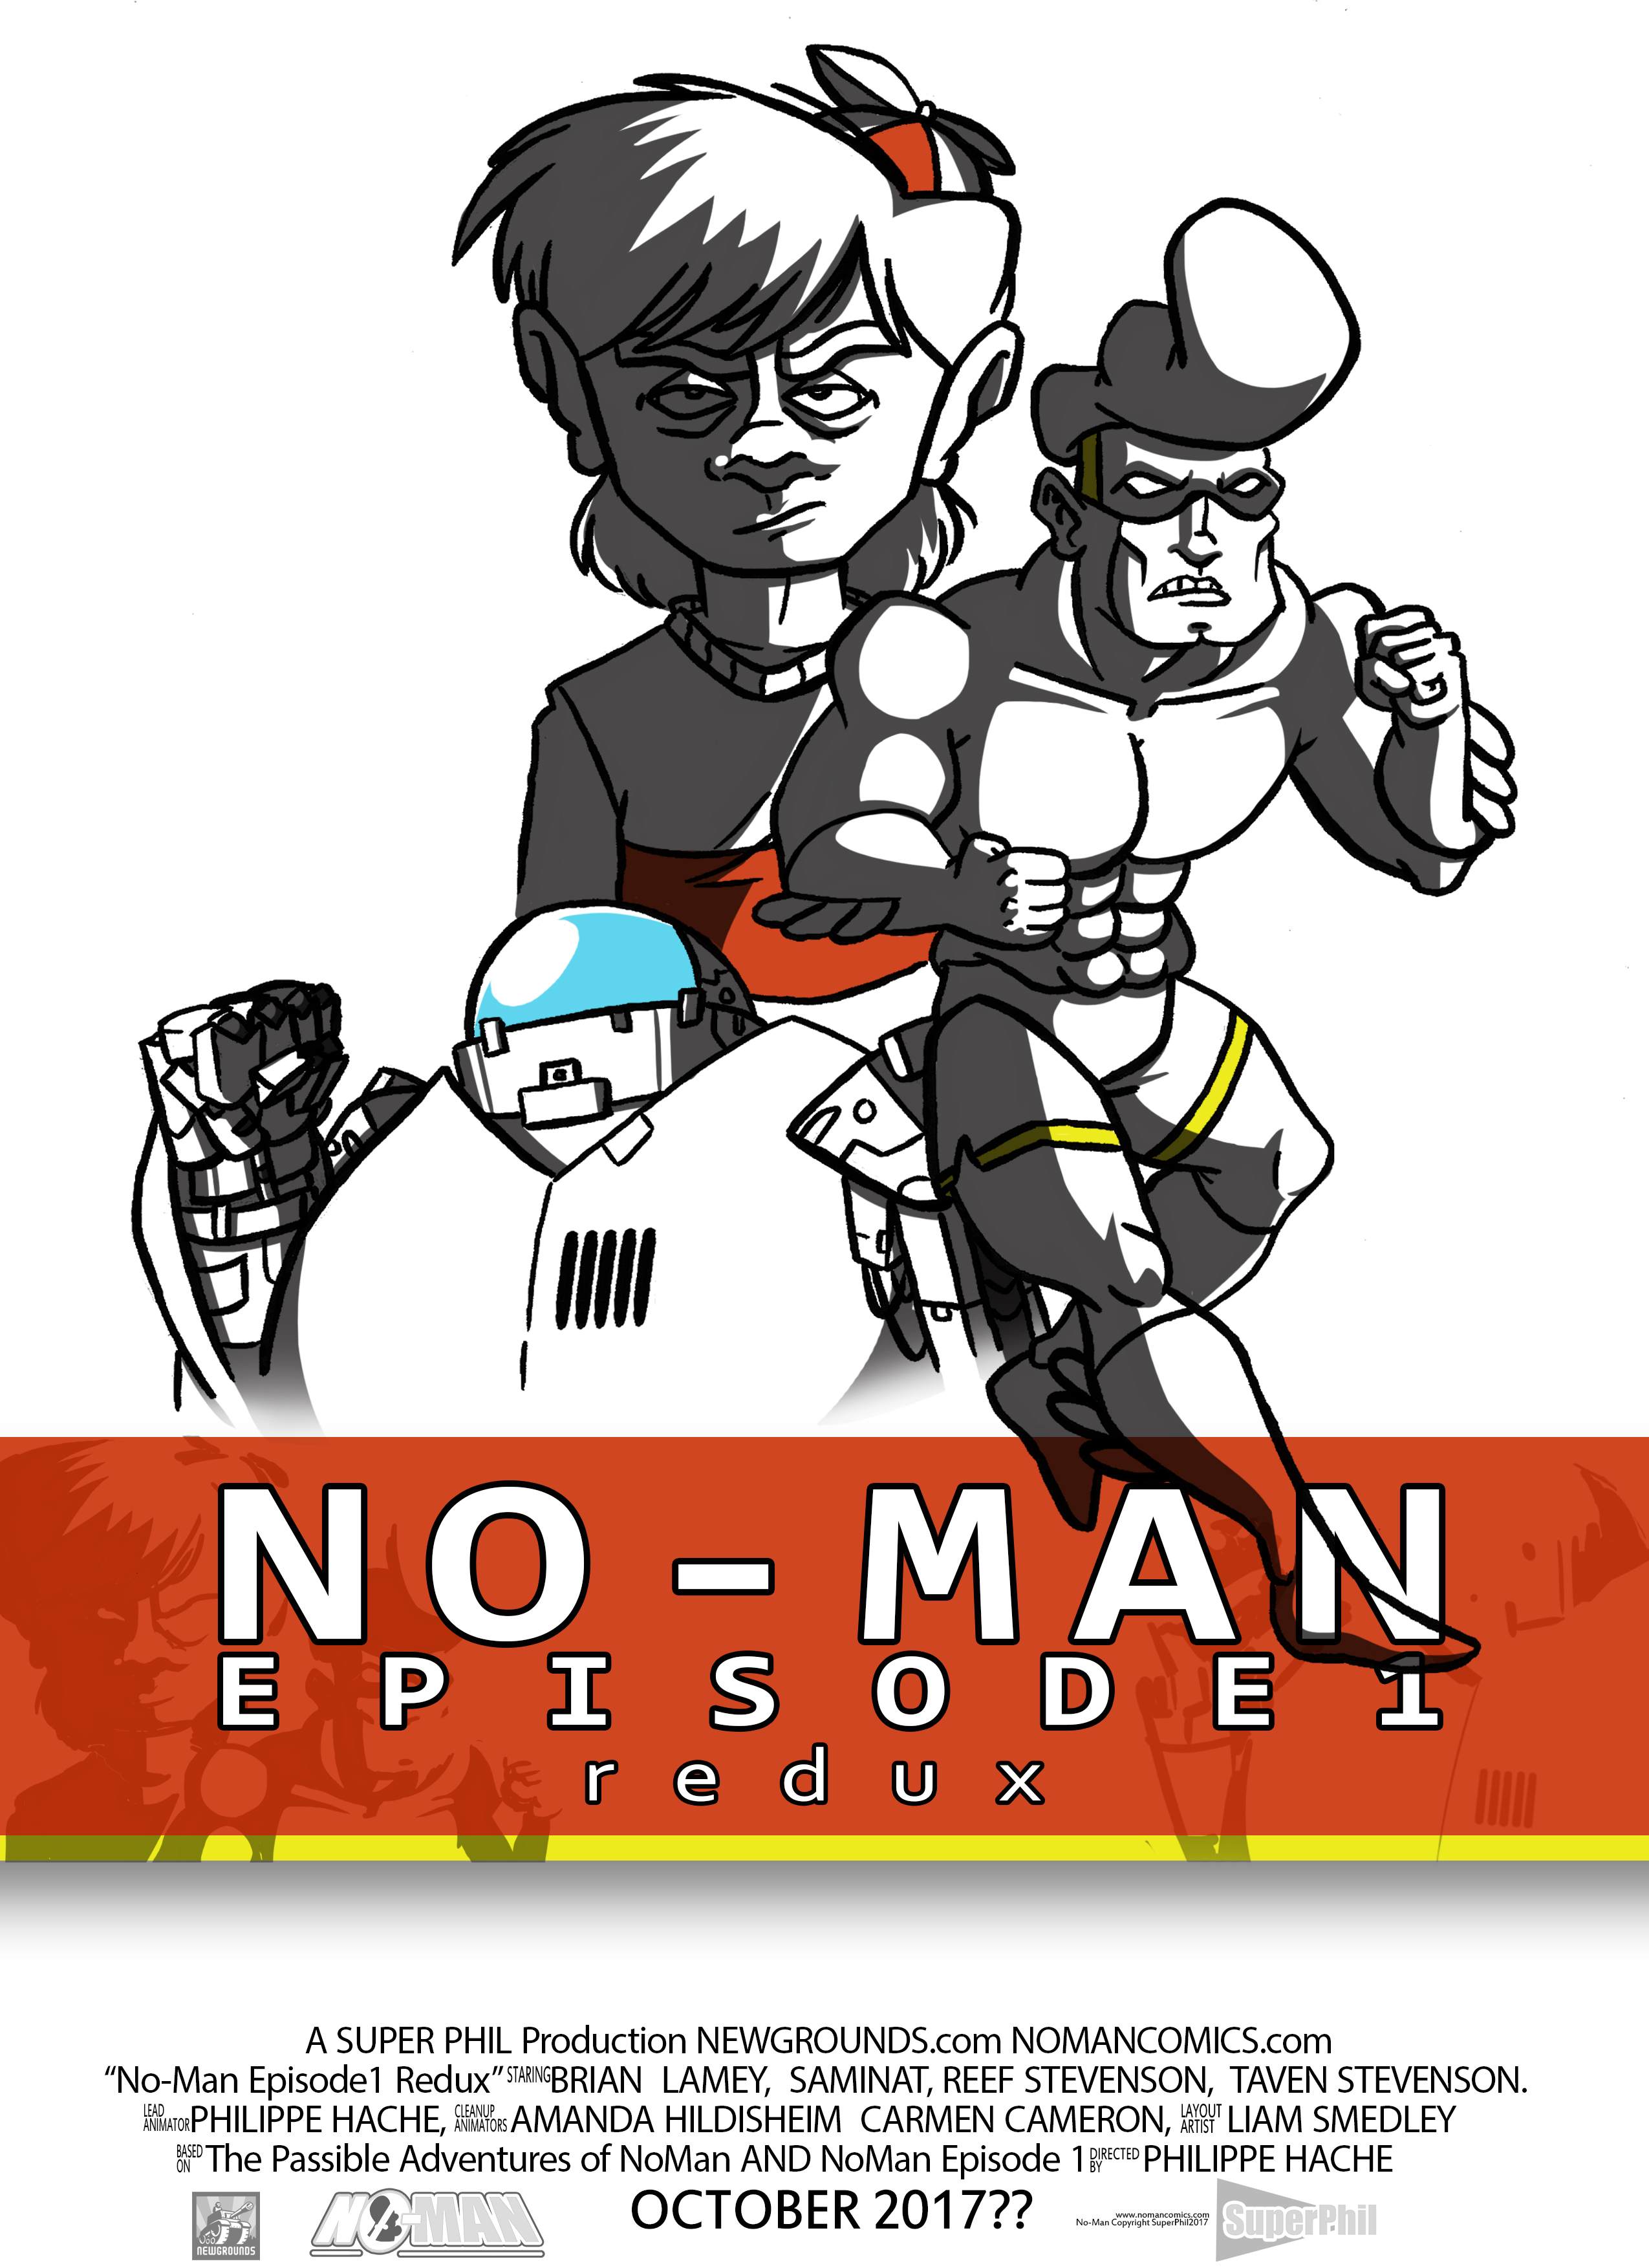 NoMan Ep1 Redux Poster